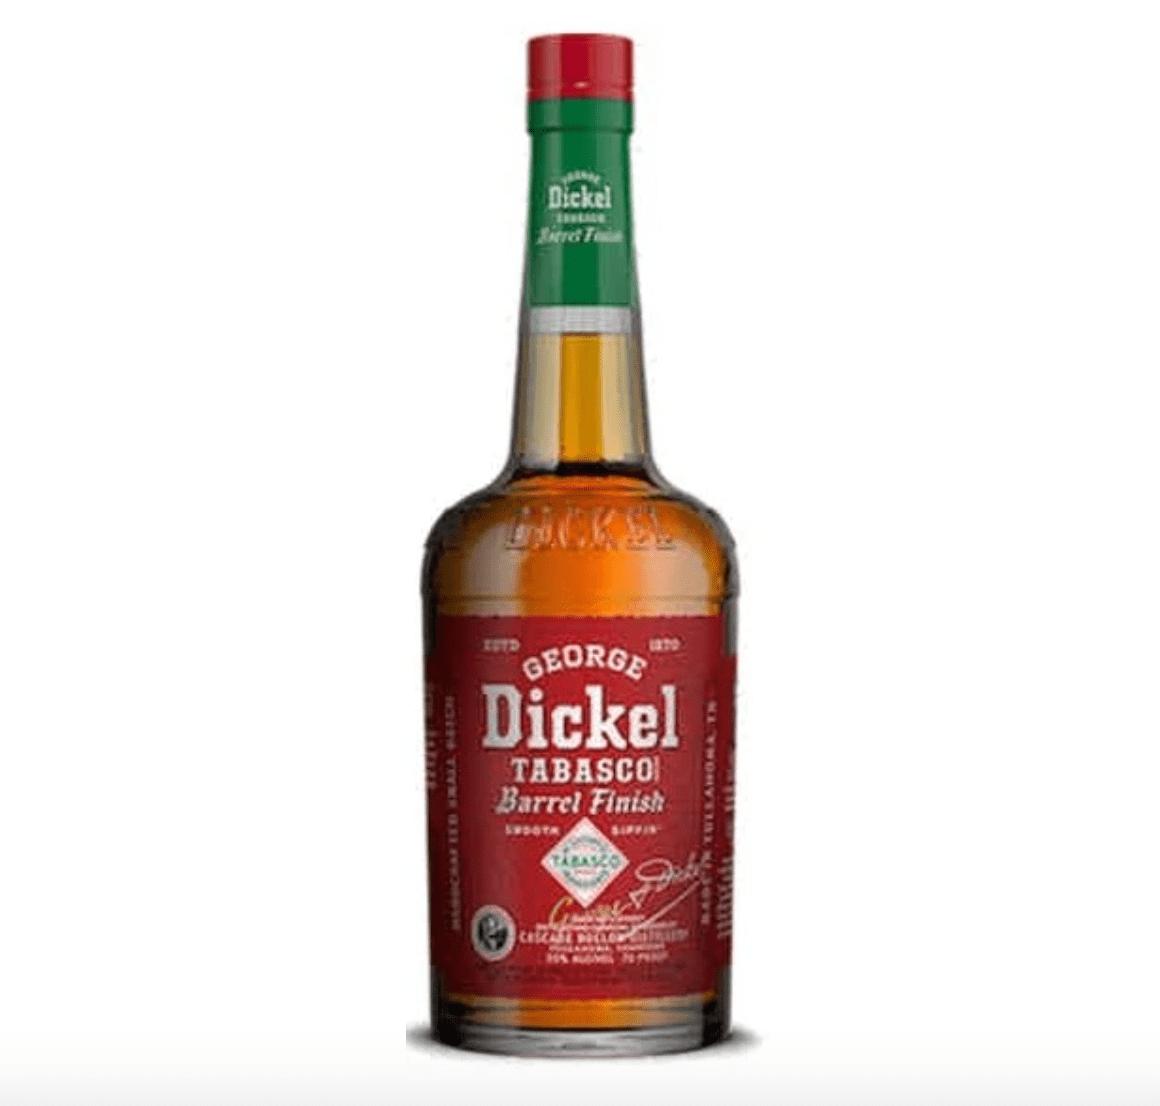 george-dickel-tabasco-barrel-finish-whiskey